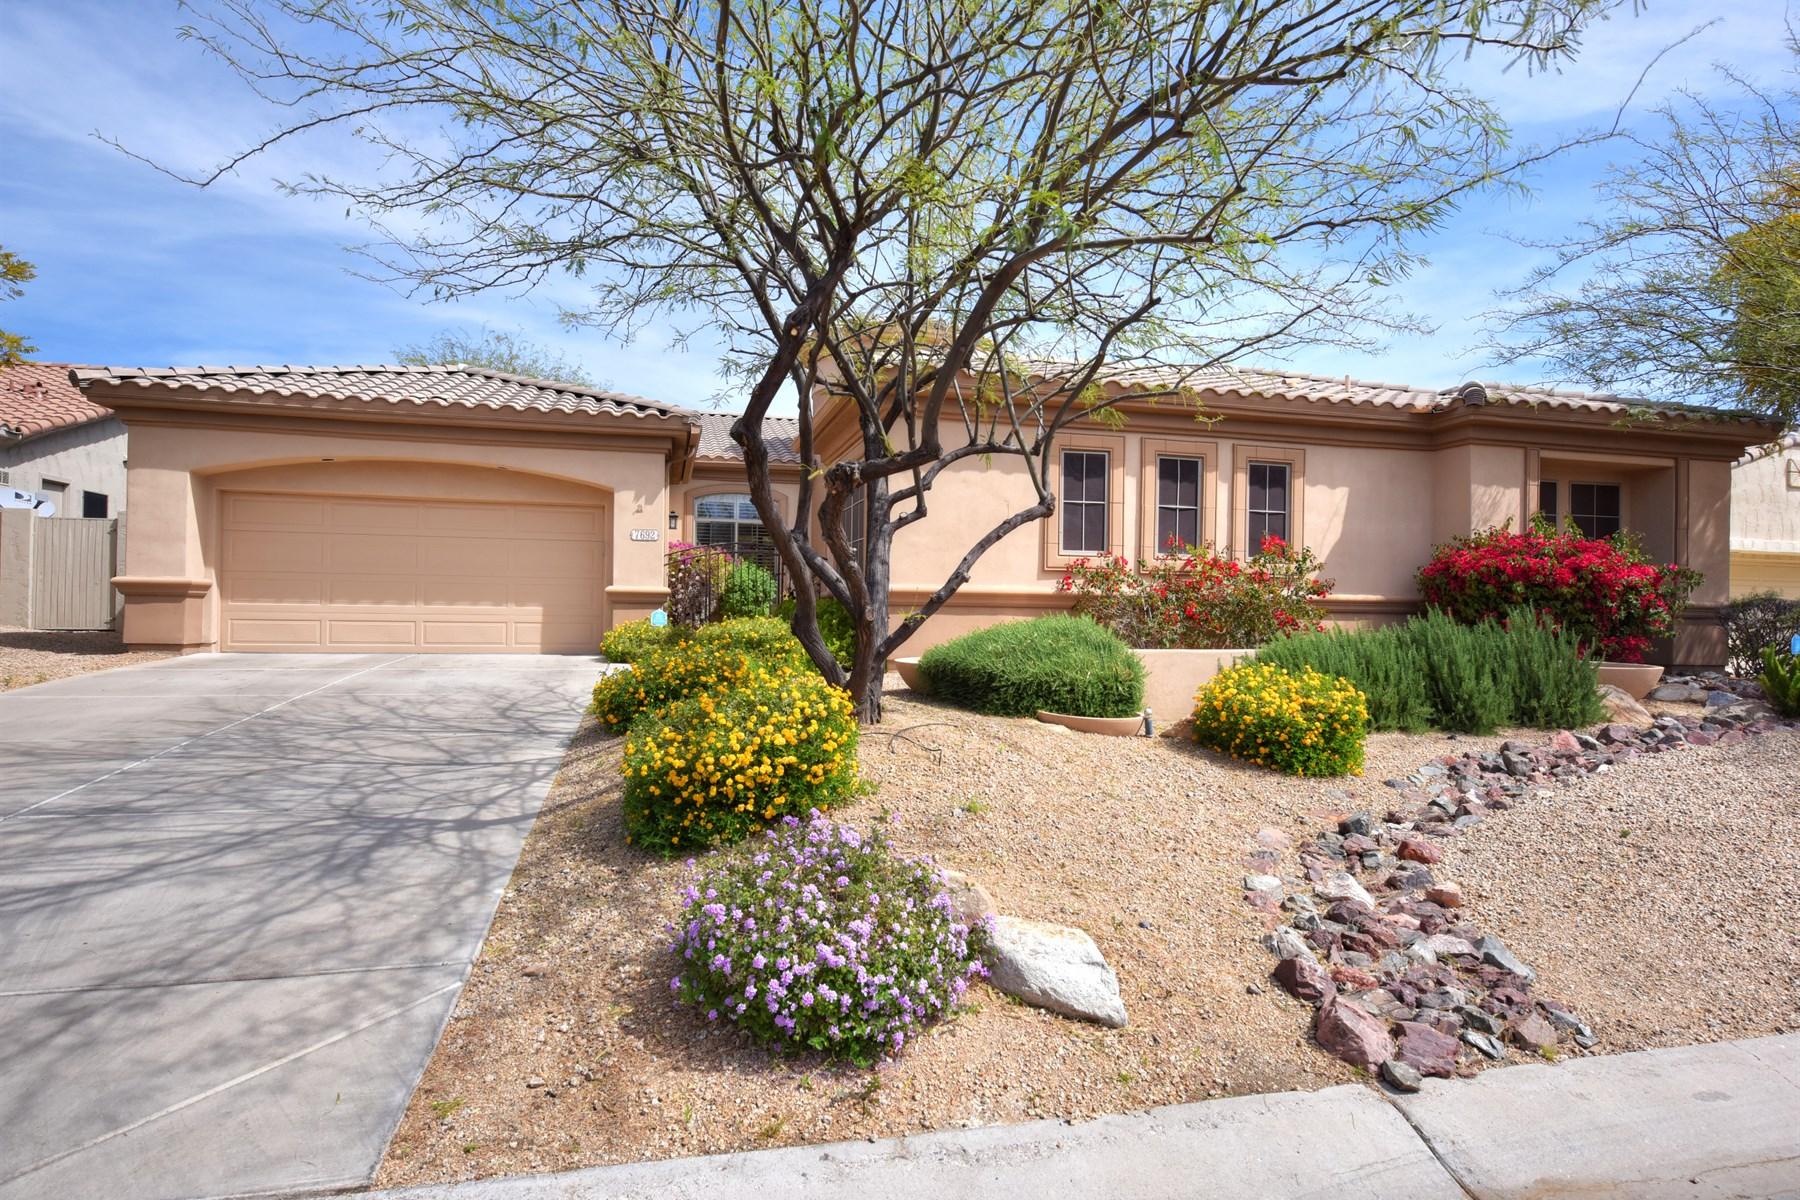 Single Family Home for Sale at Popular Maracay floor plan on quiet cul-de-sac 7692 E Tardes Dr Scottsdale, Arizona, 85255 United States